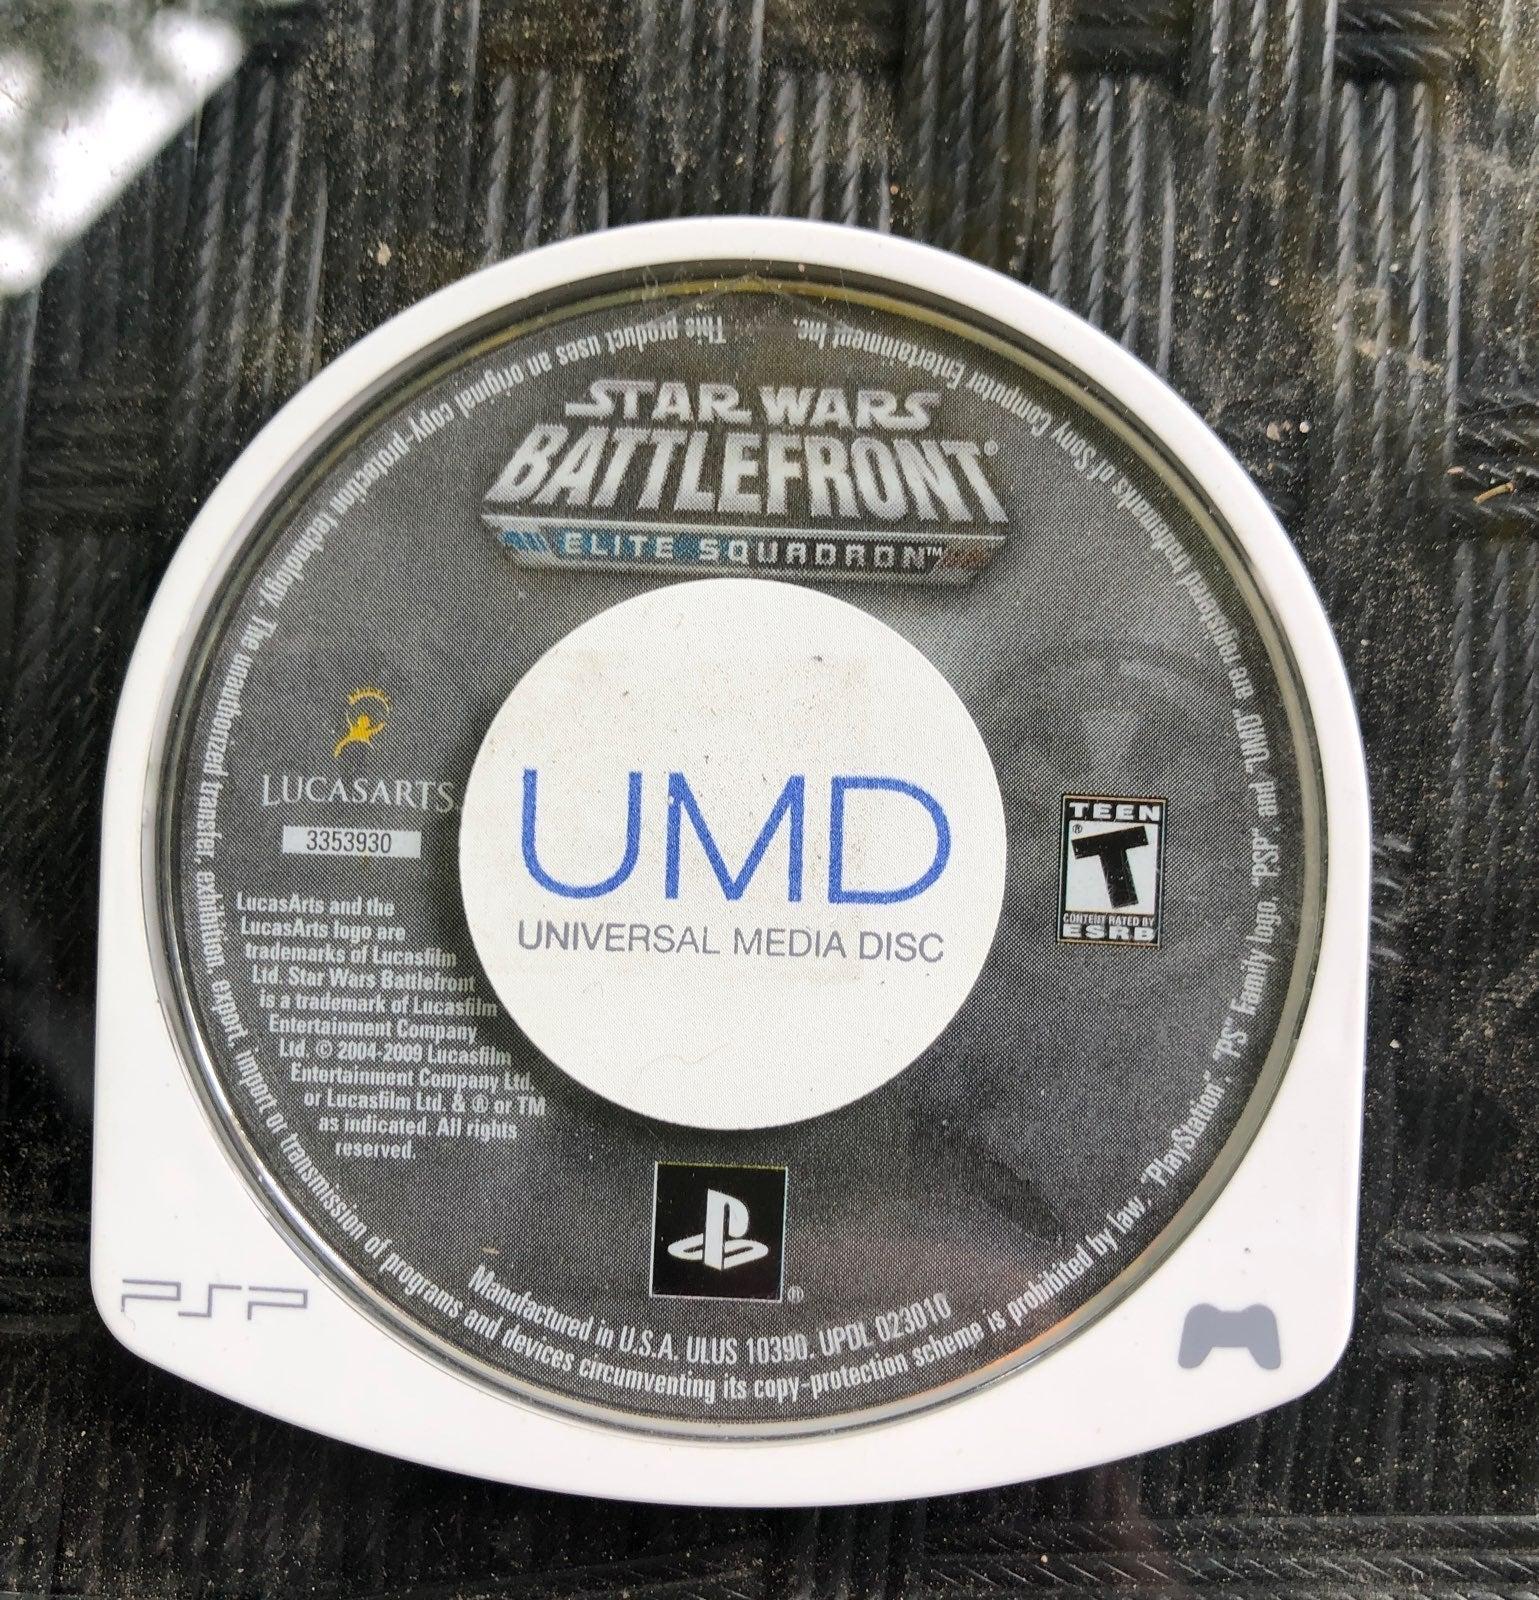 StarWars Battlefront Elite Squadron PSP